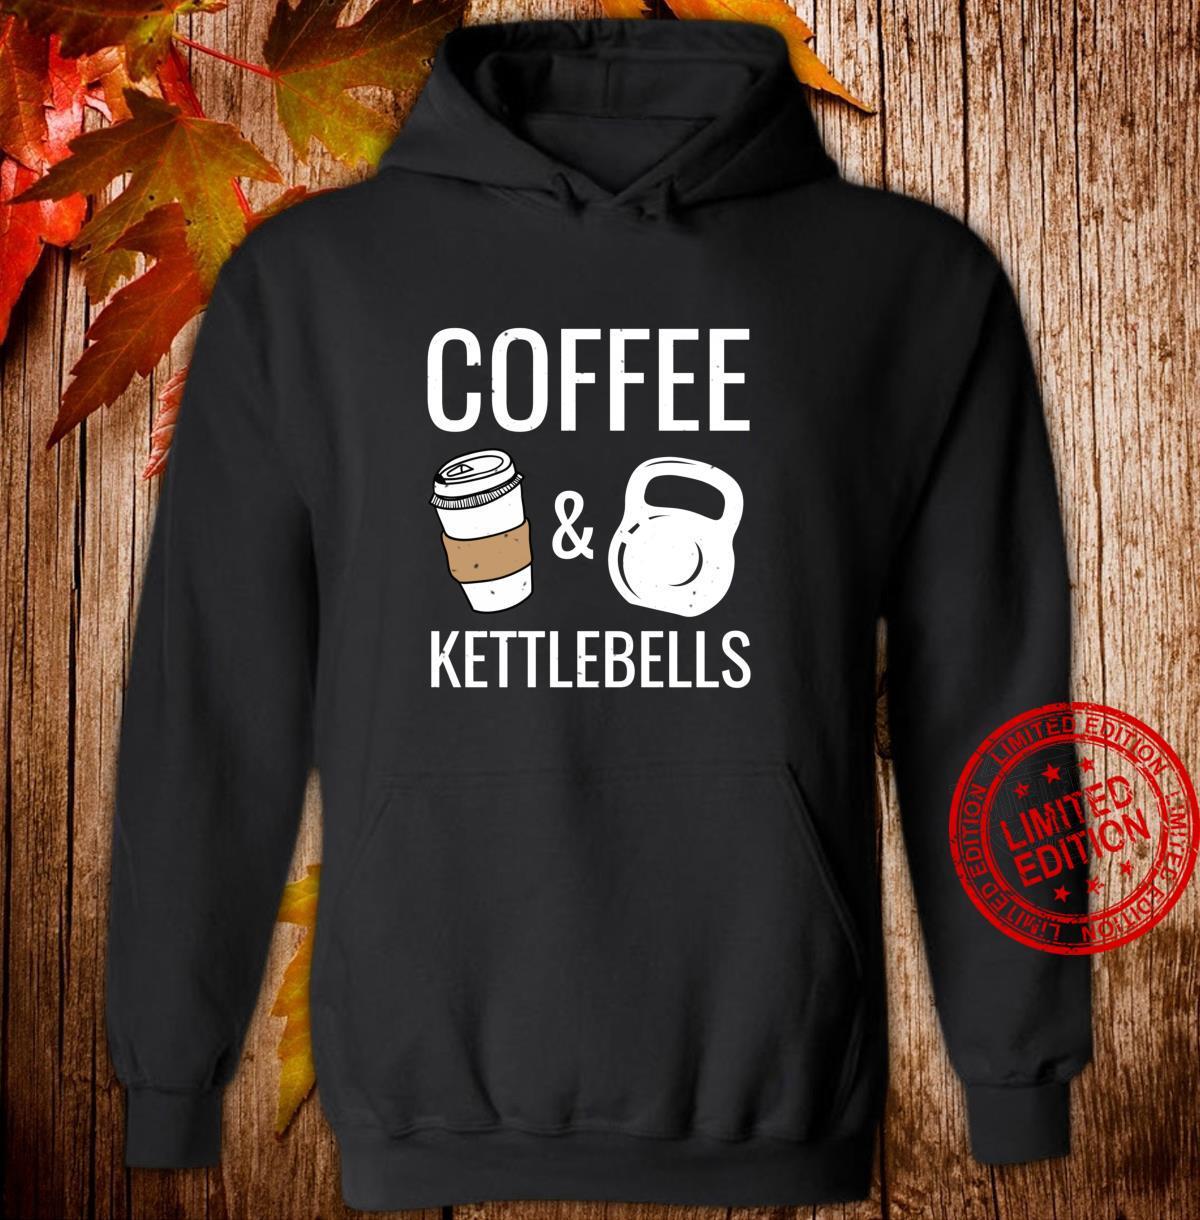 Kettlebells & Coffee HIIT Fitness Workout Gym Shirt hoodie